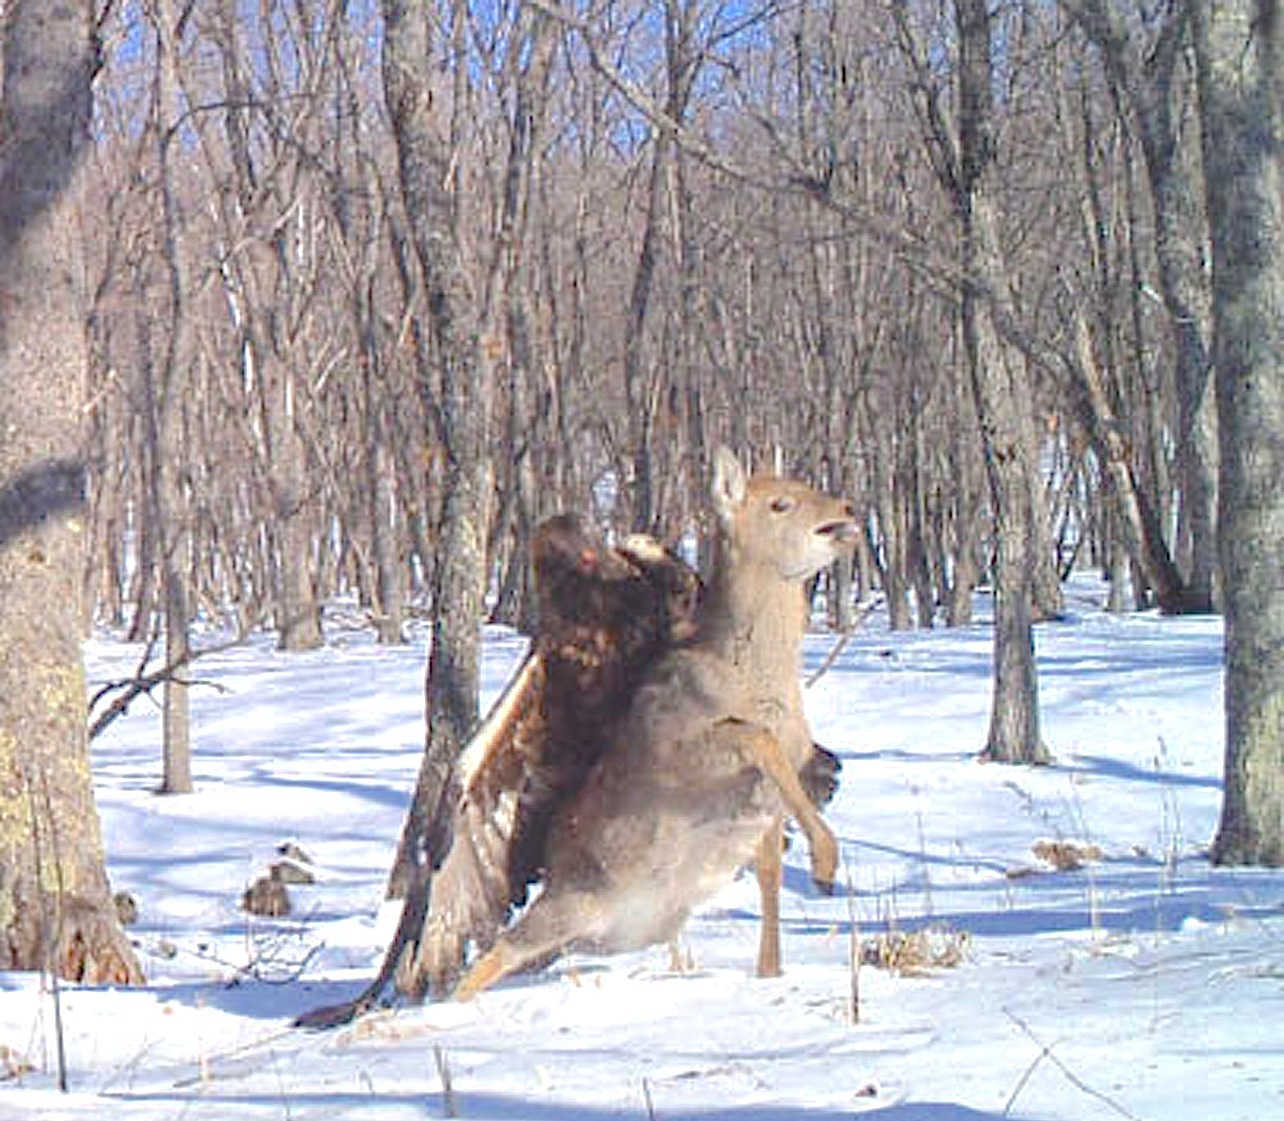 Eagle Schools Deer On Dinosaur Ancestry 171 Strange Behaviors